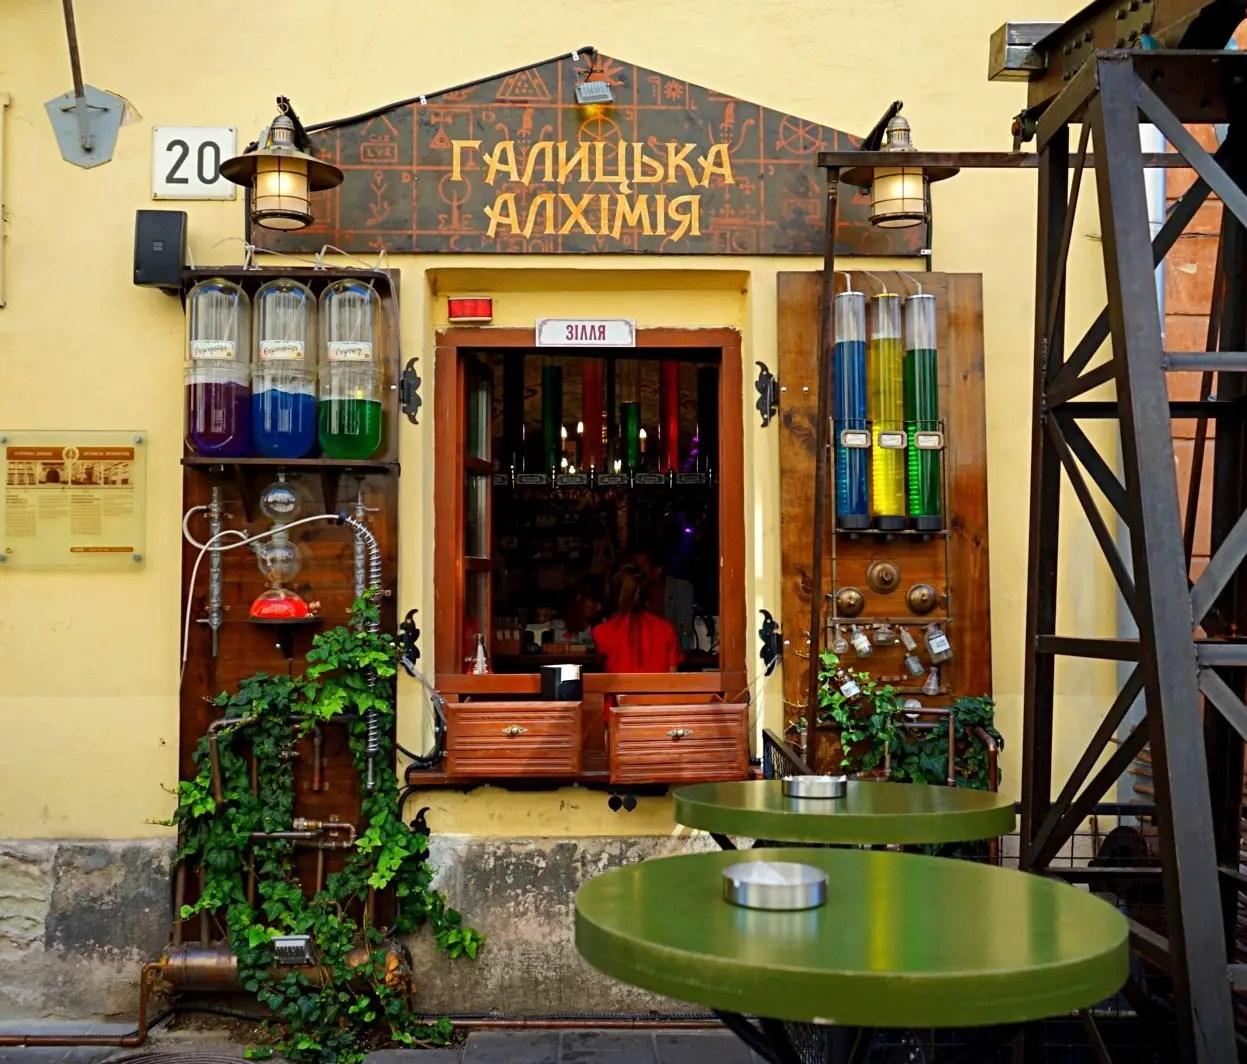 Galician Alchemy in Lviv, entrance